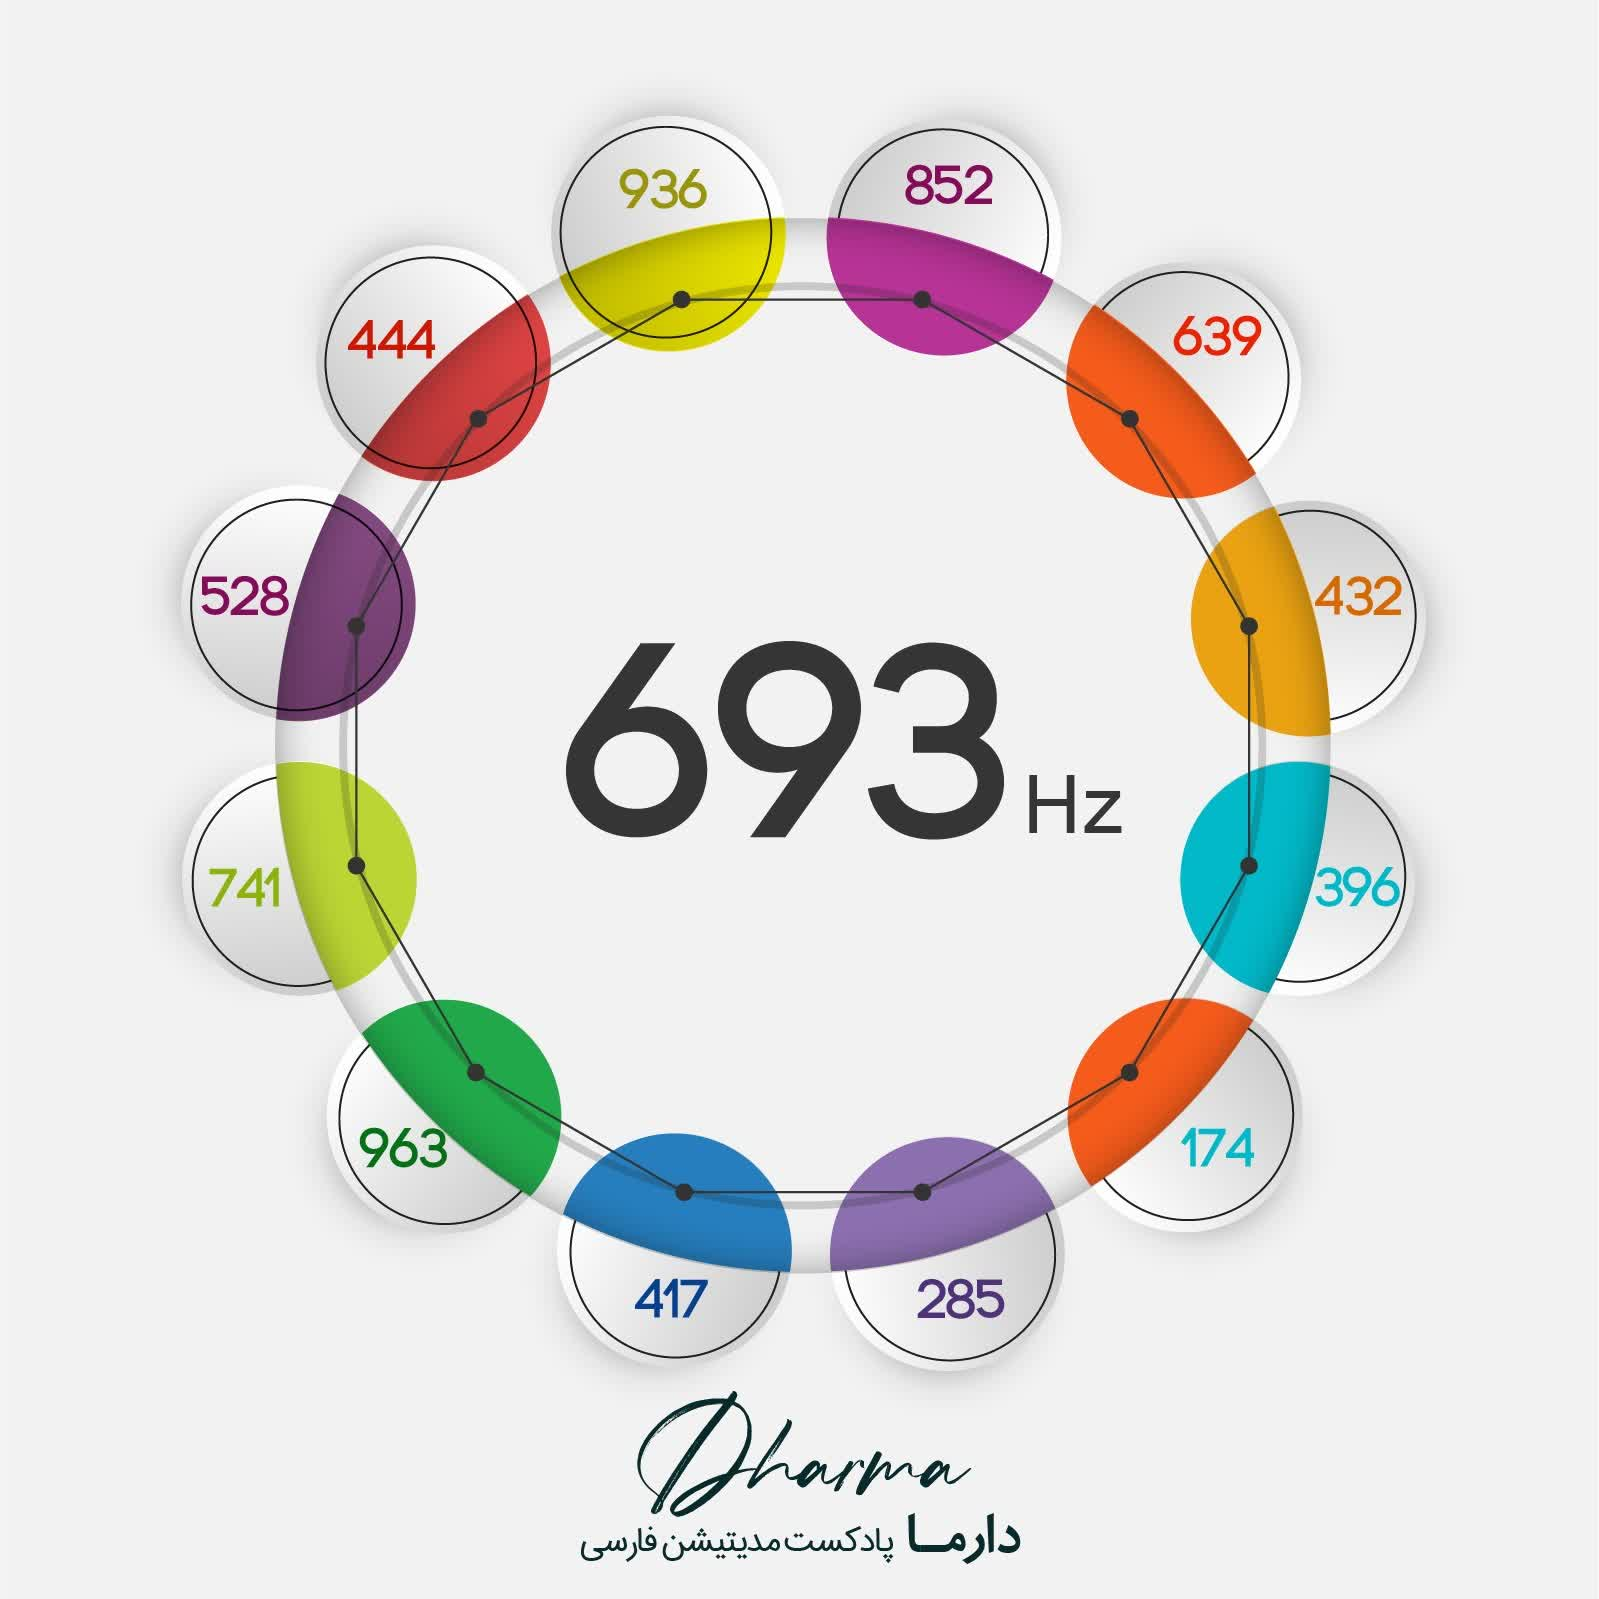 693Hz - فرکانس 693 هرتز